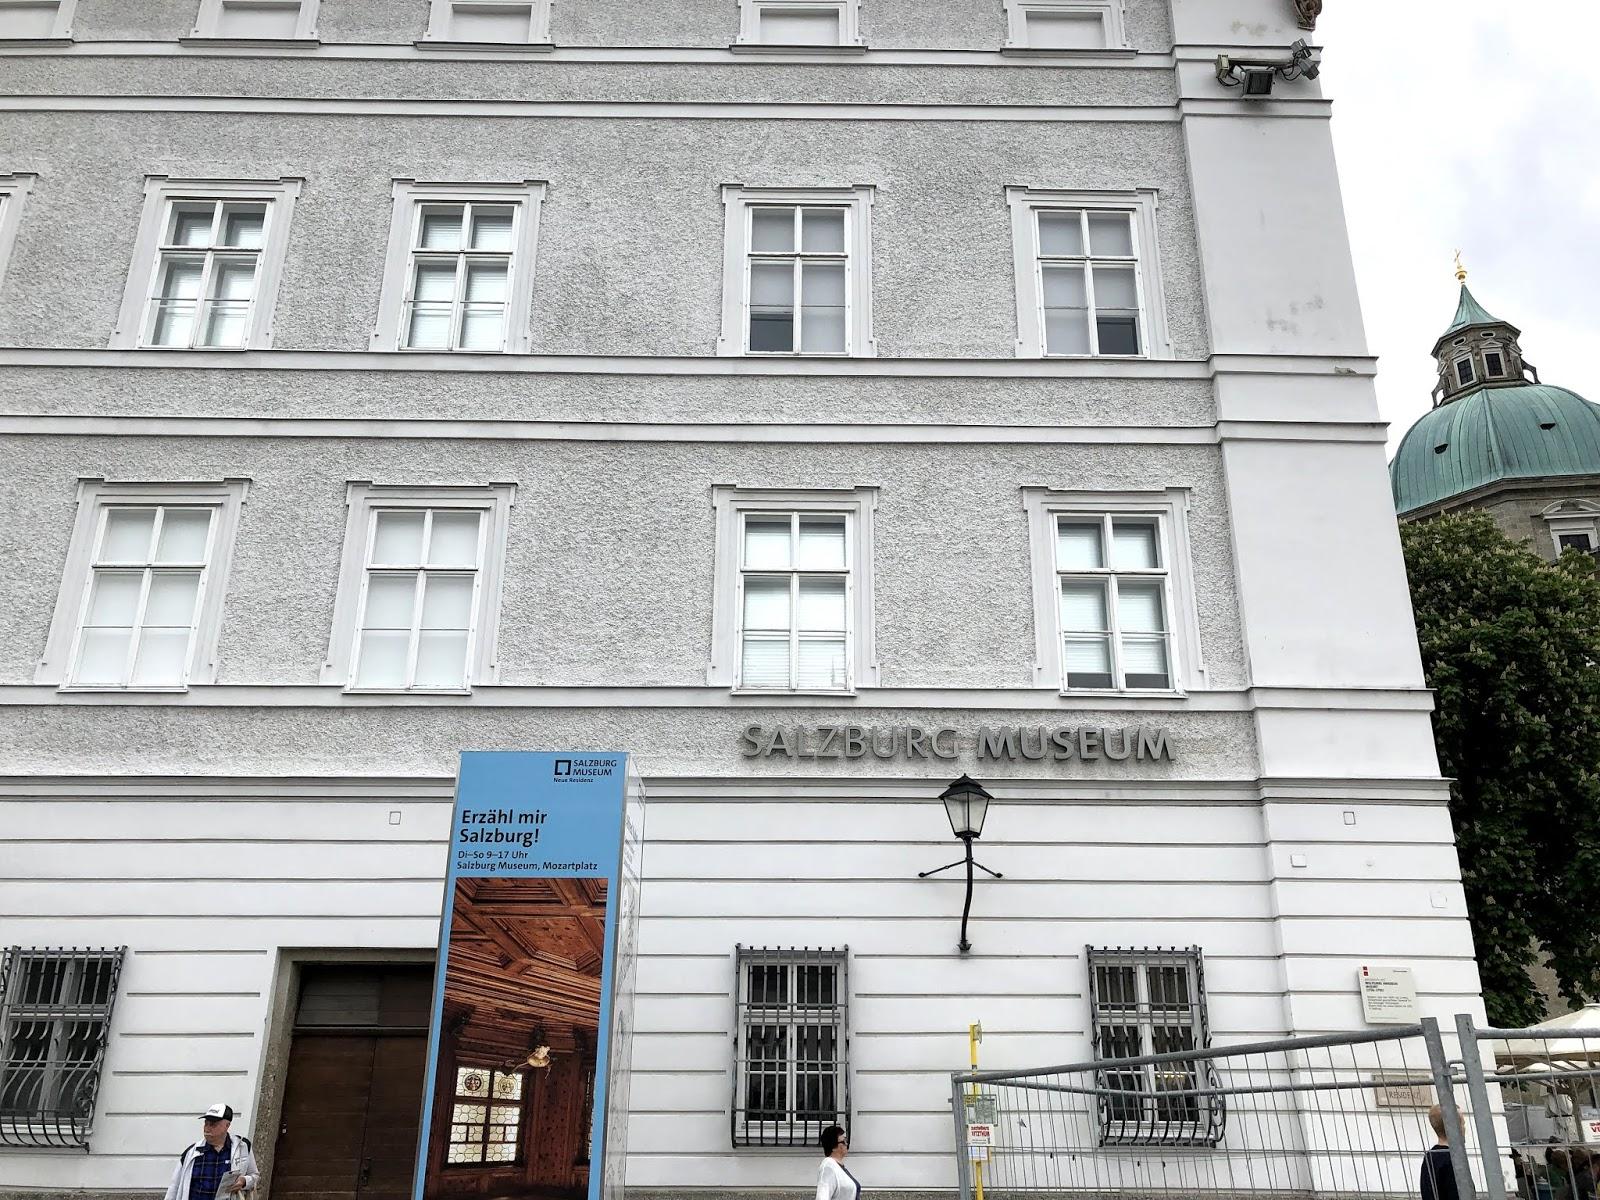 salzburg itinerary Salzburg Museum